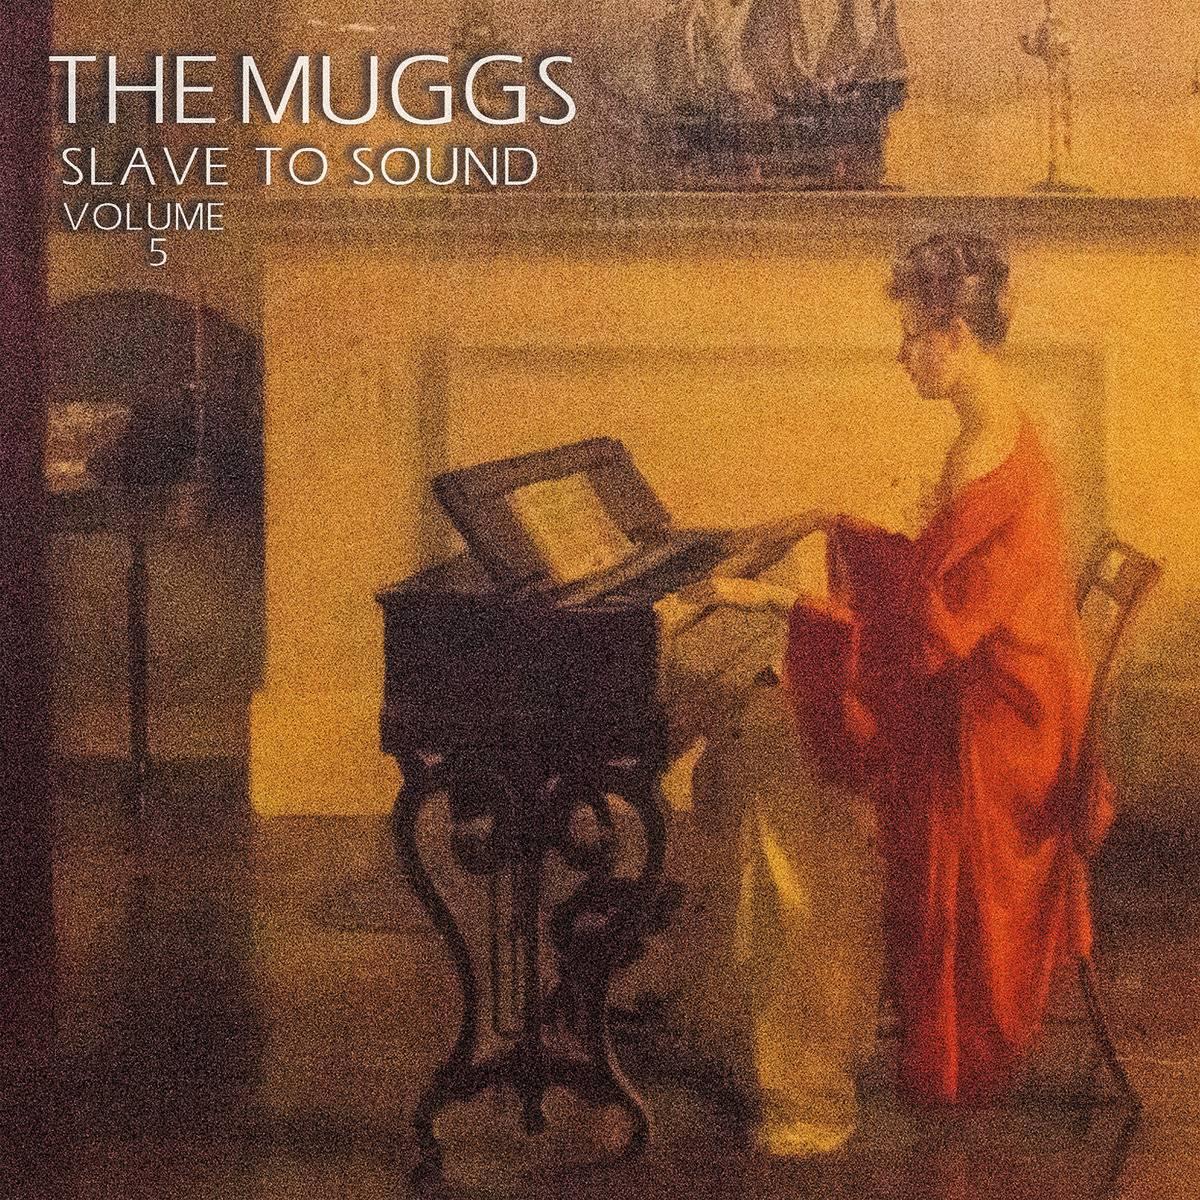 Slave To Sound Vol 5  The Muggs